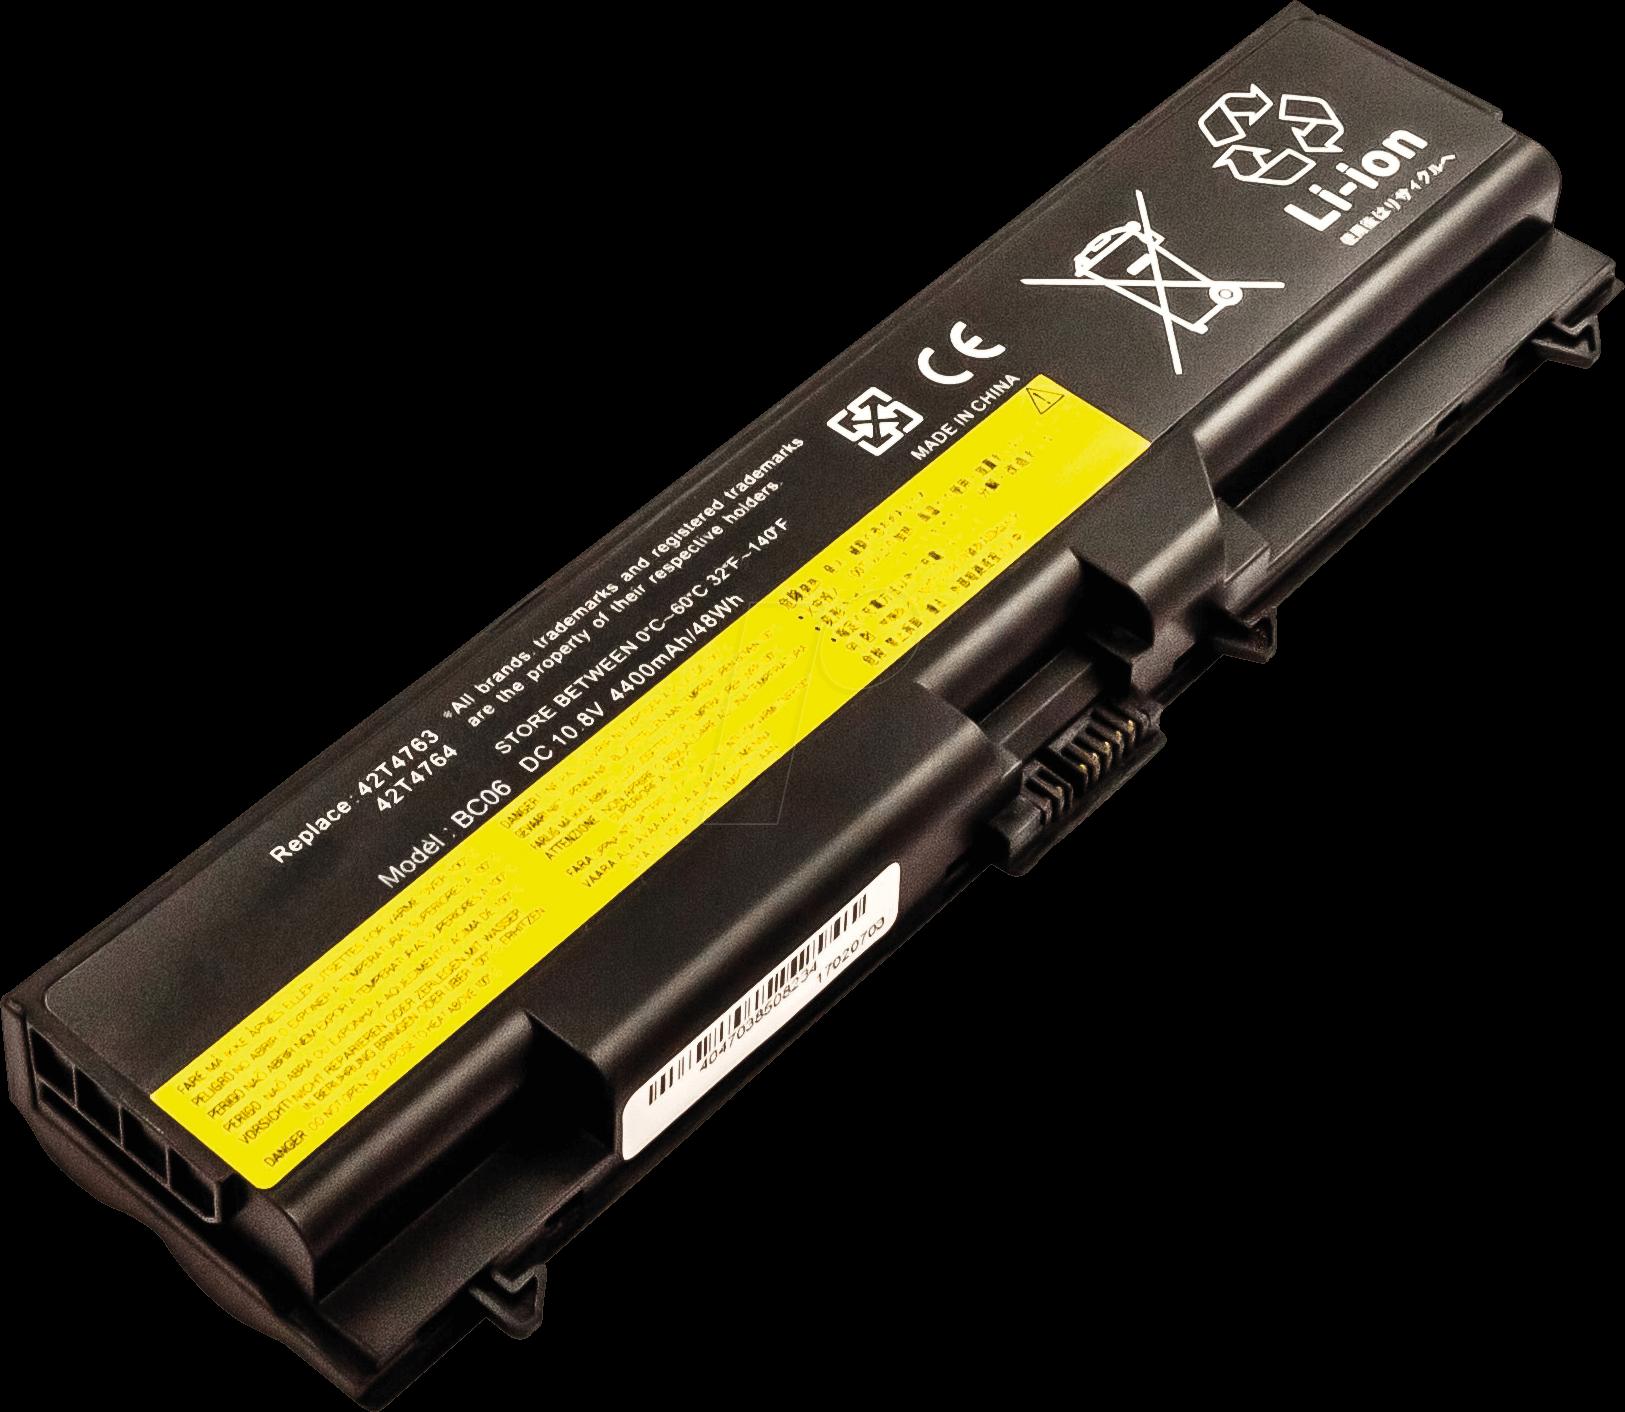 AKKU 50823 - Laptop battery for Lenovo, Li-Ion, 4400 mAh